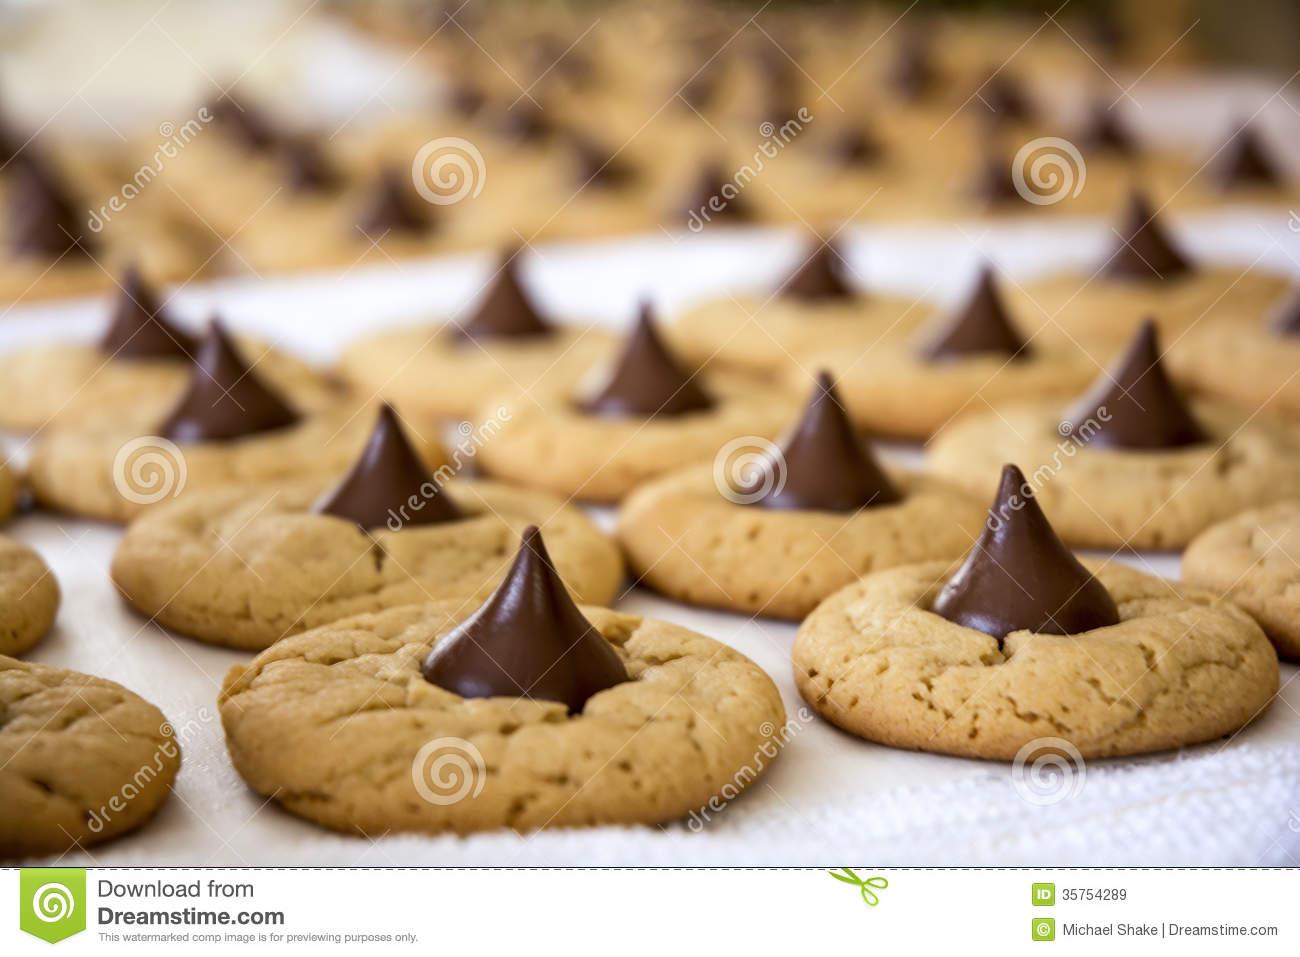 Fresh Baked Cookies Stock Image  Image Of Baking, Cookies